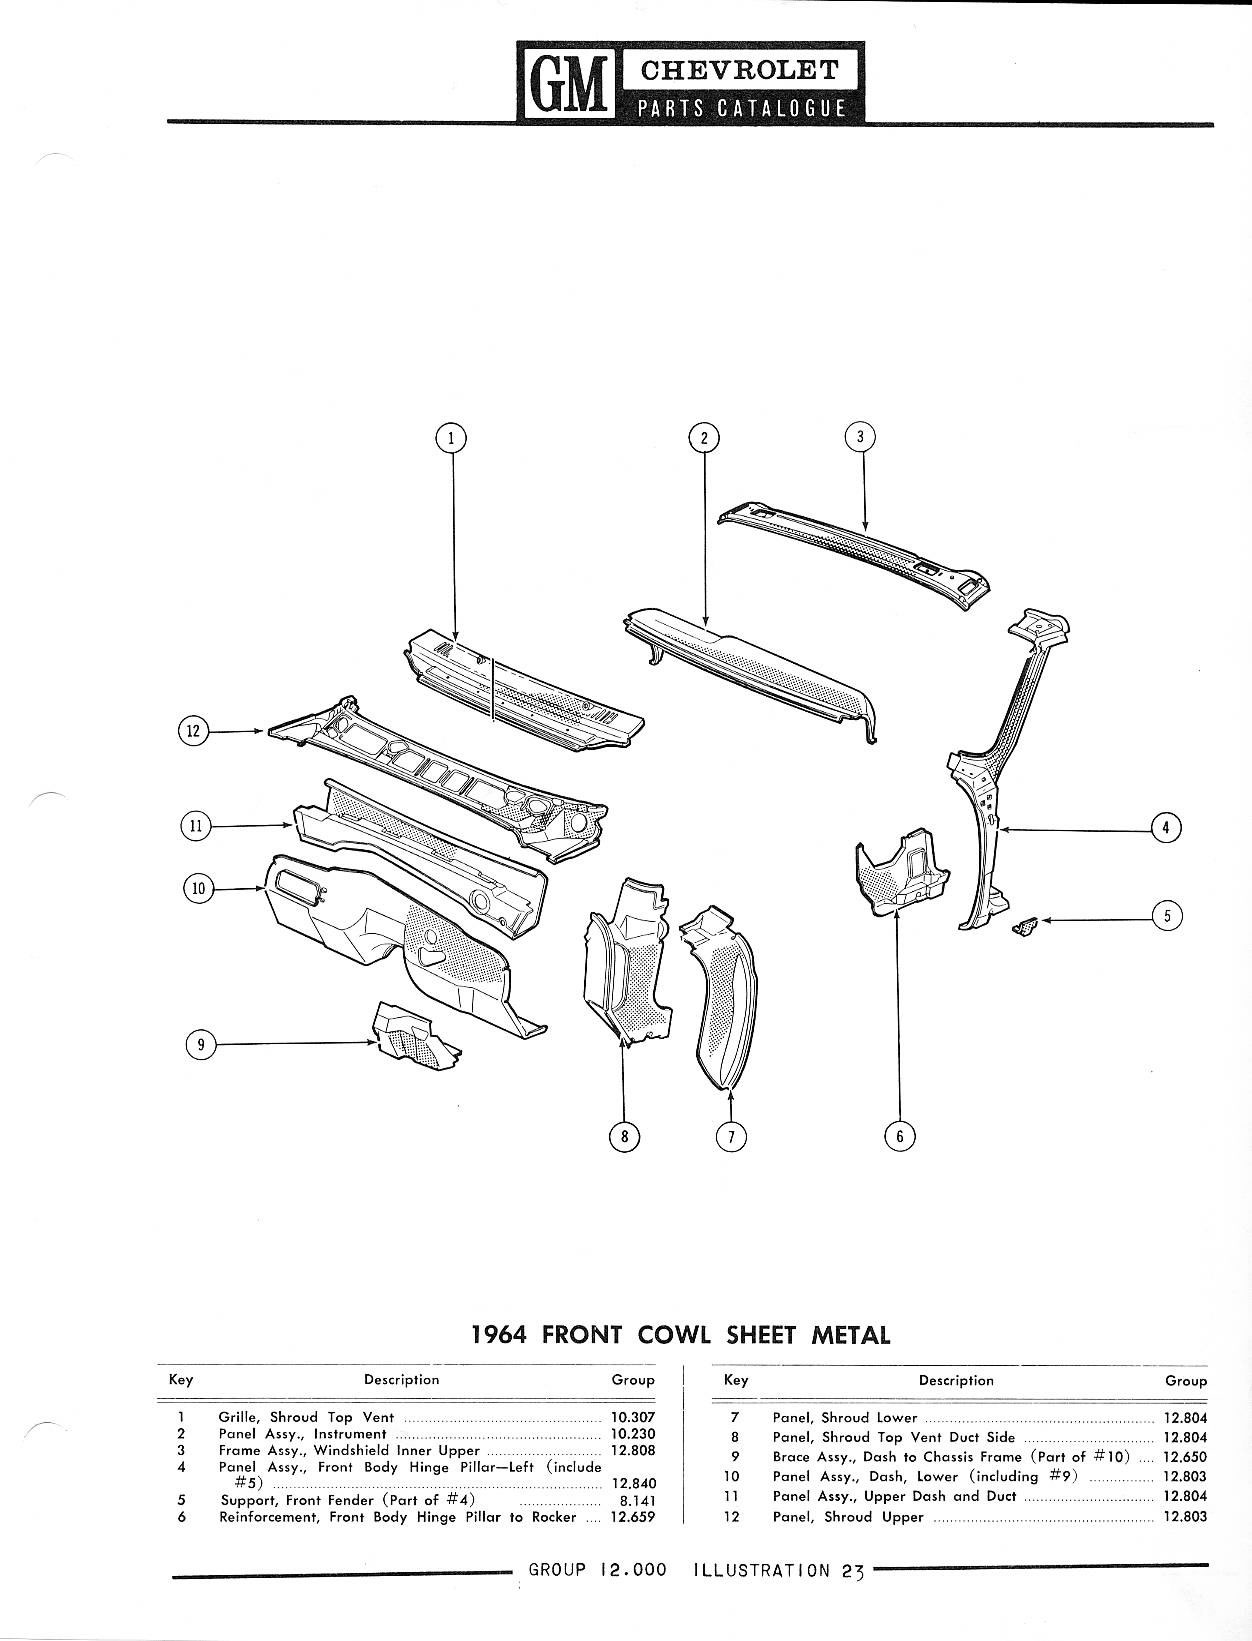 1958 chevrolet parts catalog